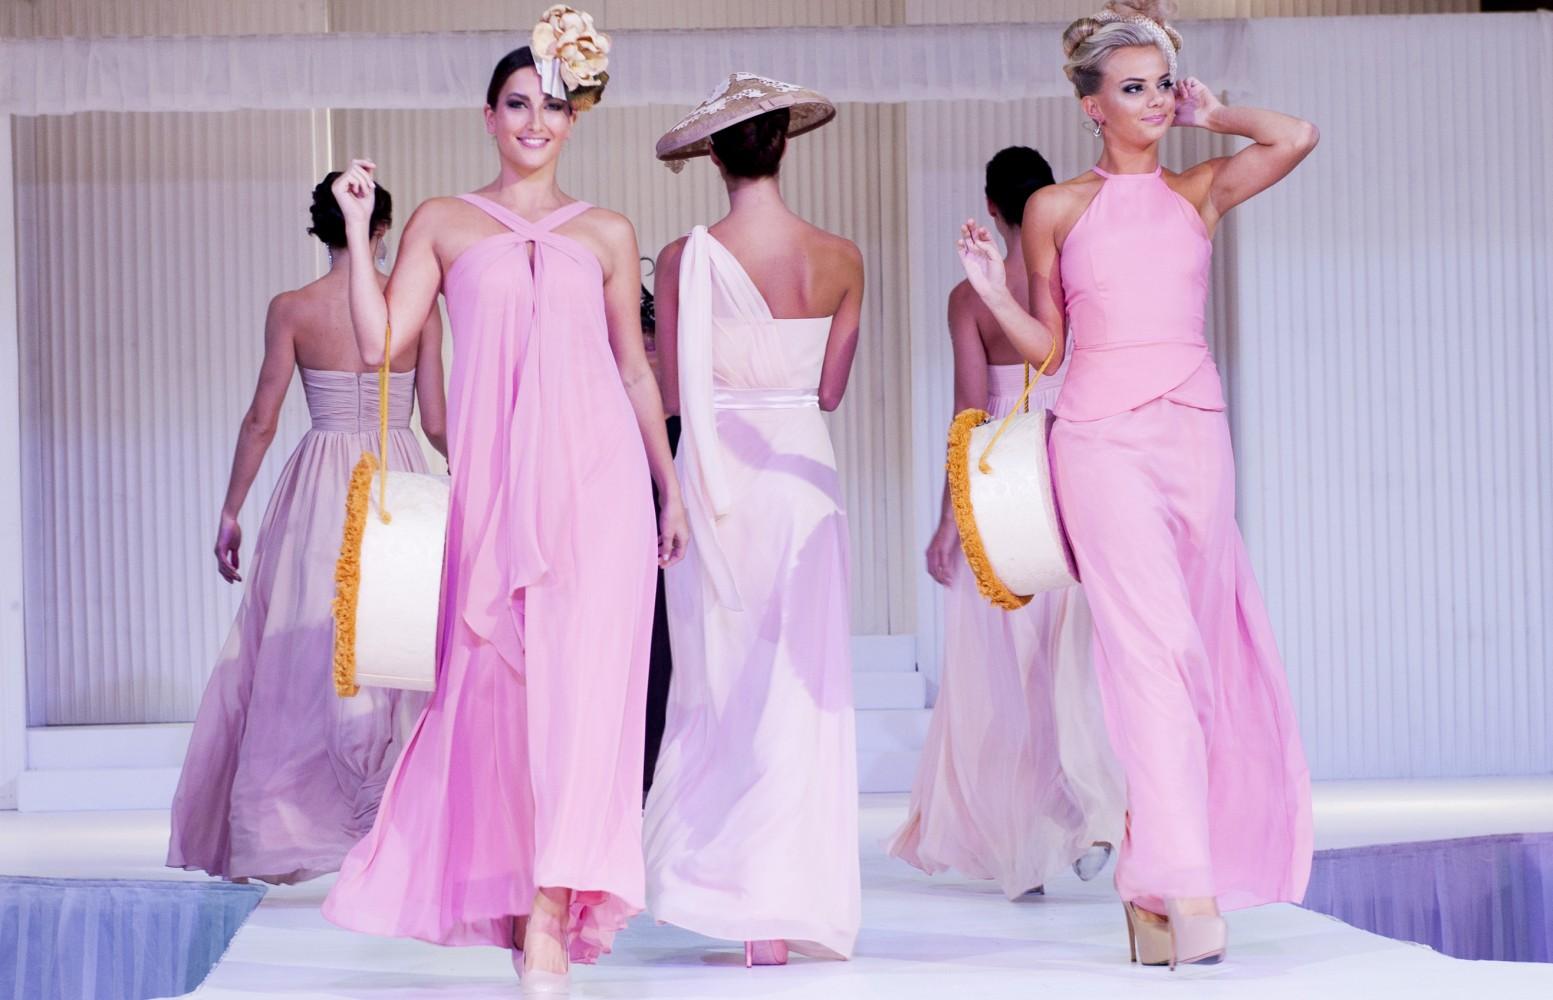 sydney bridal expo natasha millani bridesmaid dresses pink